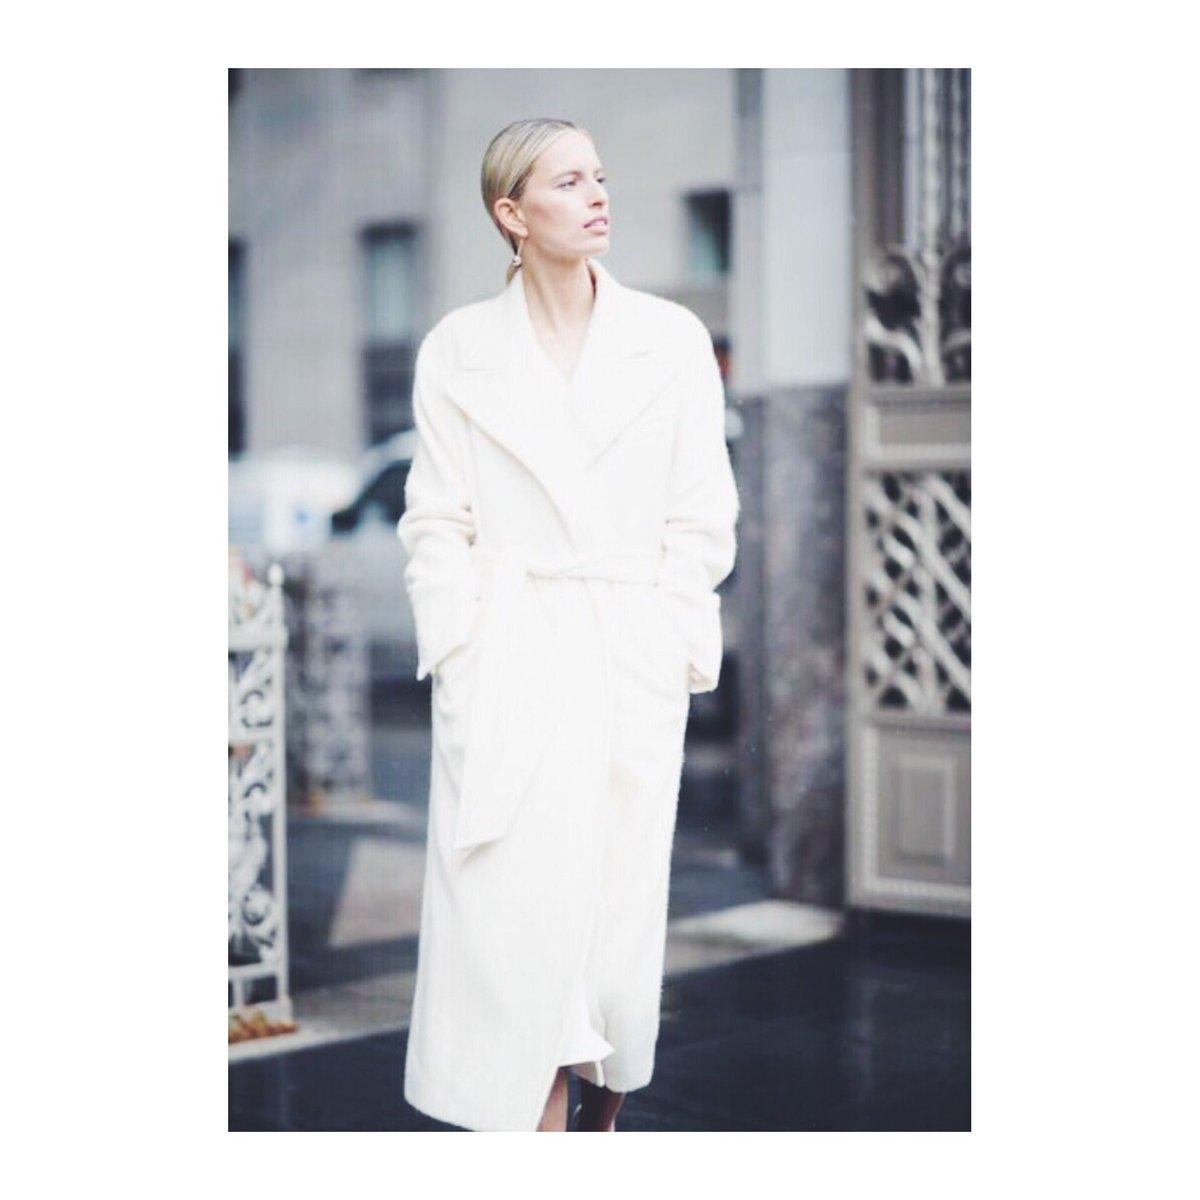 Karolina Kurkova  - Winter White twitter @karolinakurkova kkstyle,fashion,style,winter,winterstyle